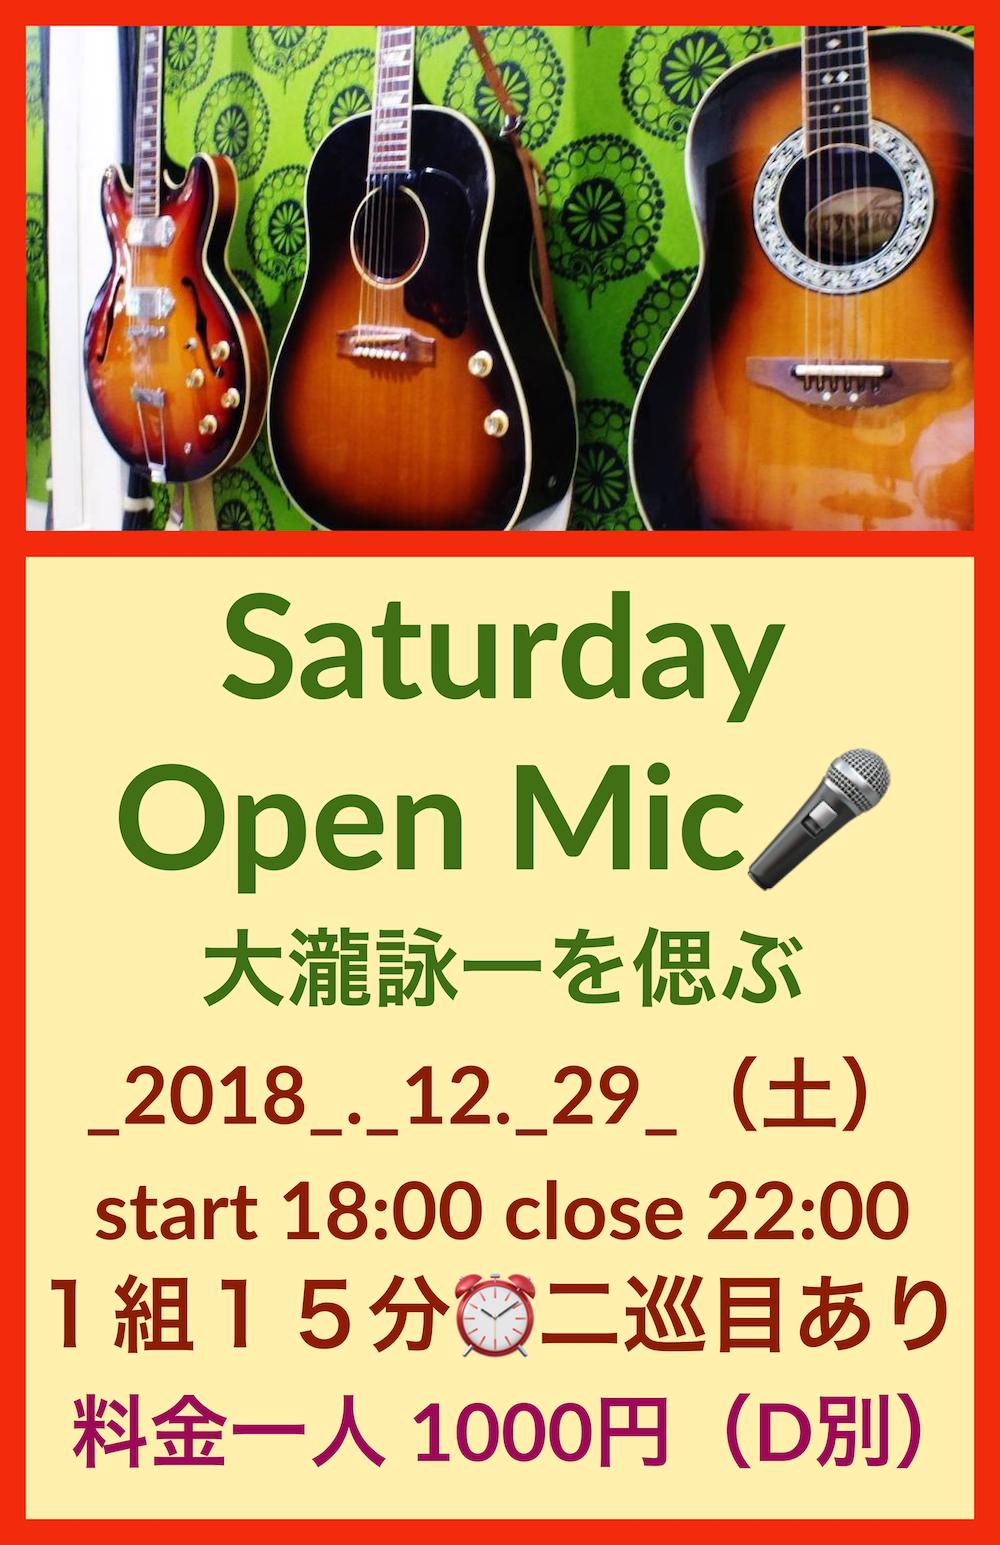 Saturday Open Mic 〜大瀧詠一を偲ぶ〜